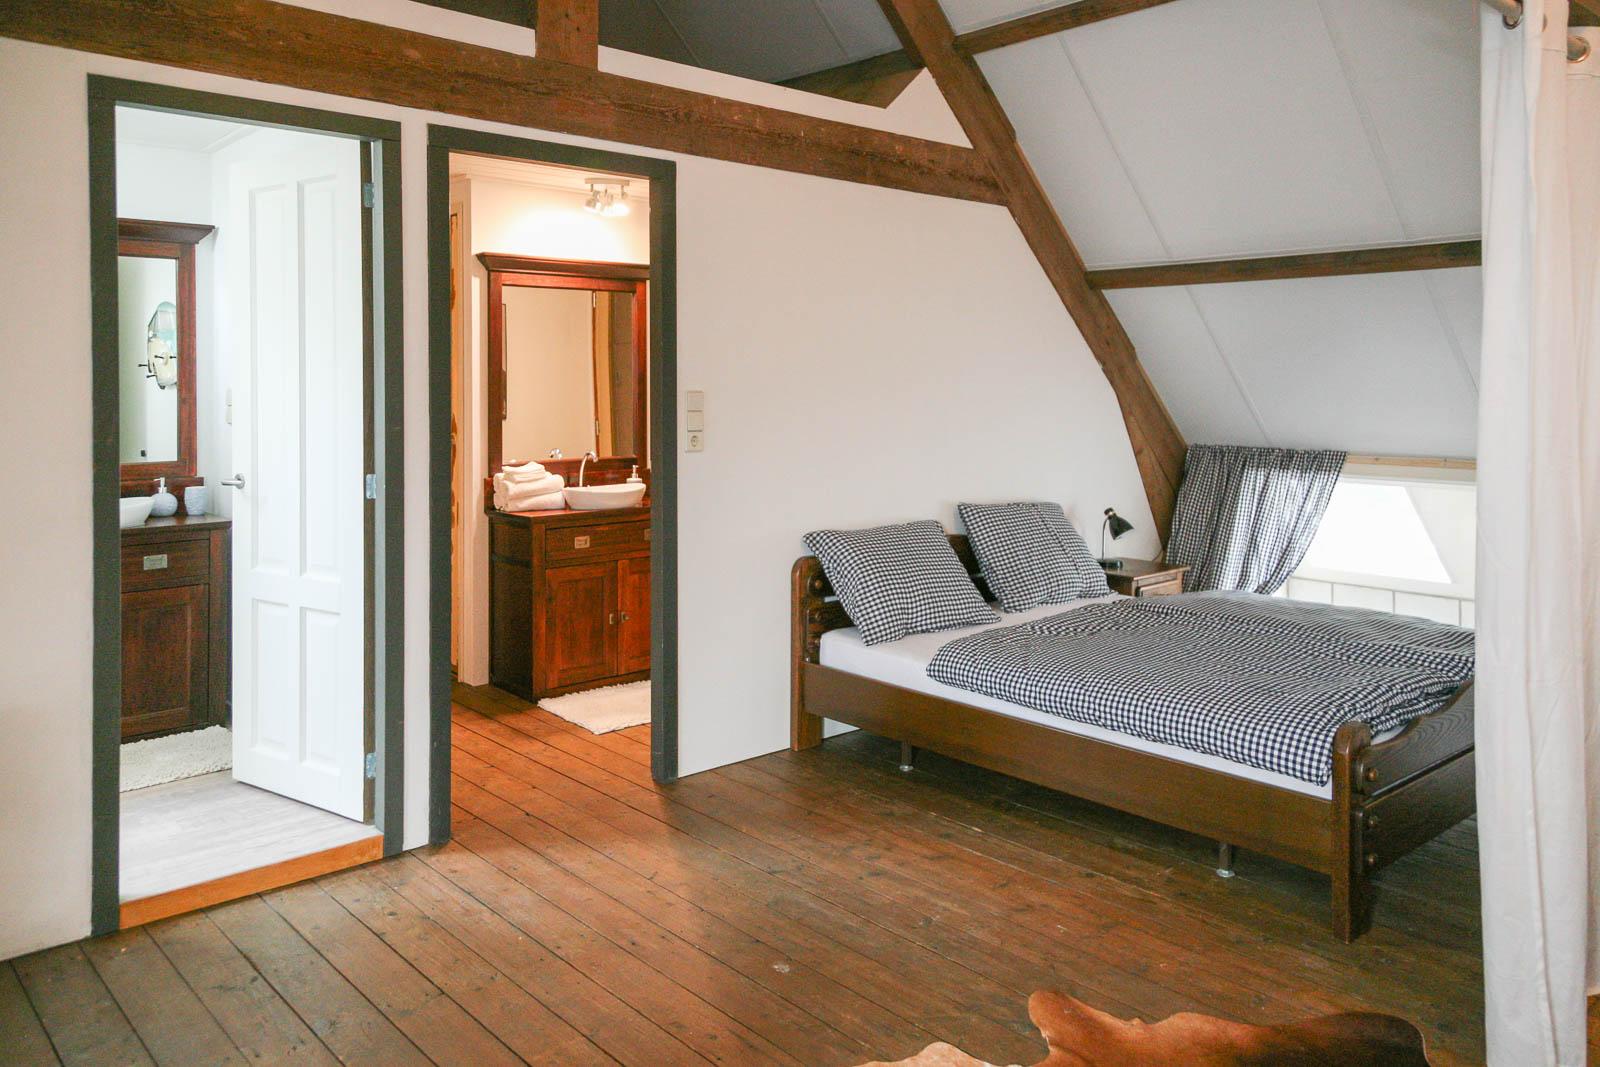 Hillegondahoeve-De Oude Stal-1450